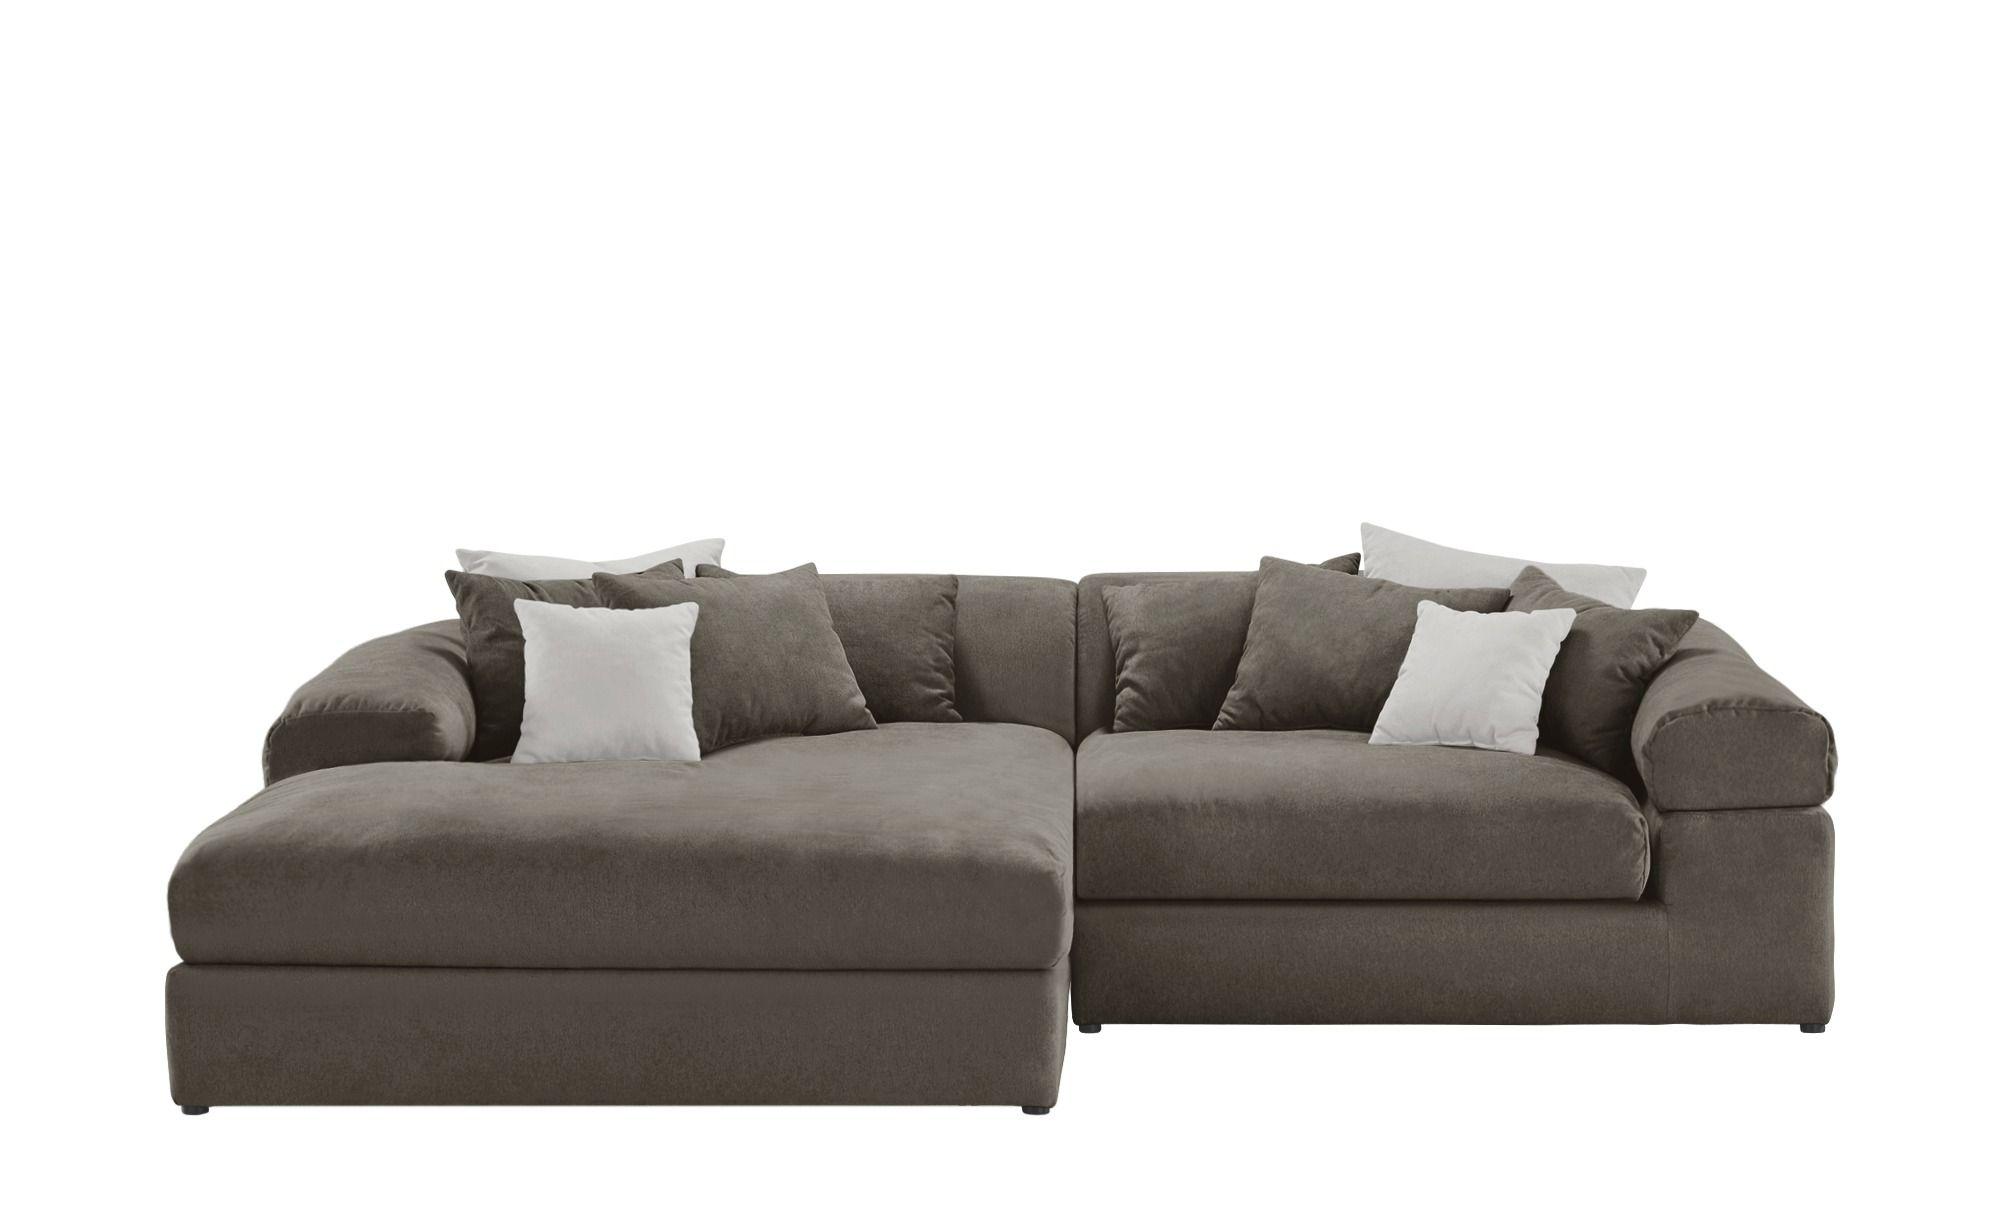 Smart Ecksofa Grau Silbergrau Flachgewebe Lianea Sofa Ecksofa Big Sofa Kaufen